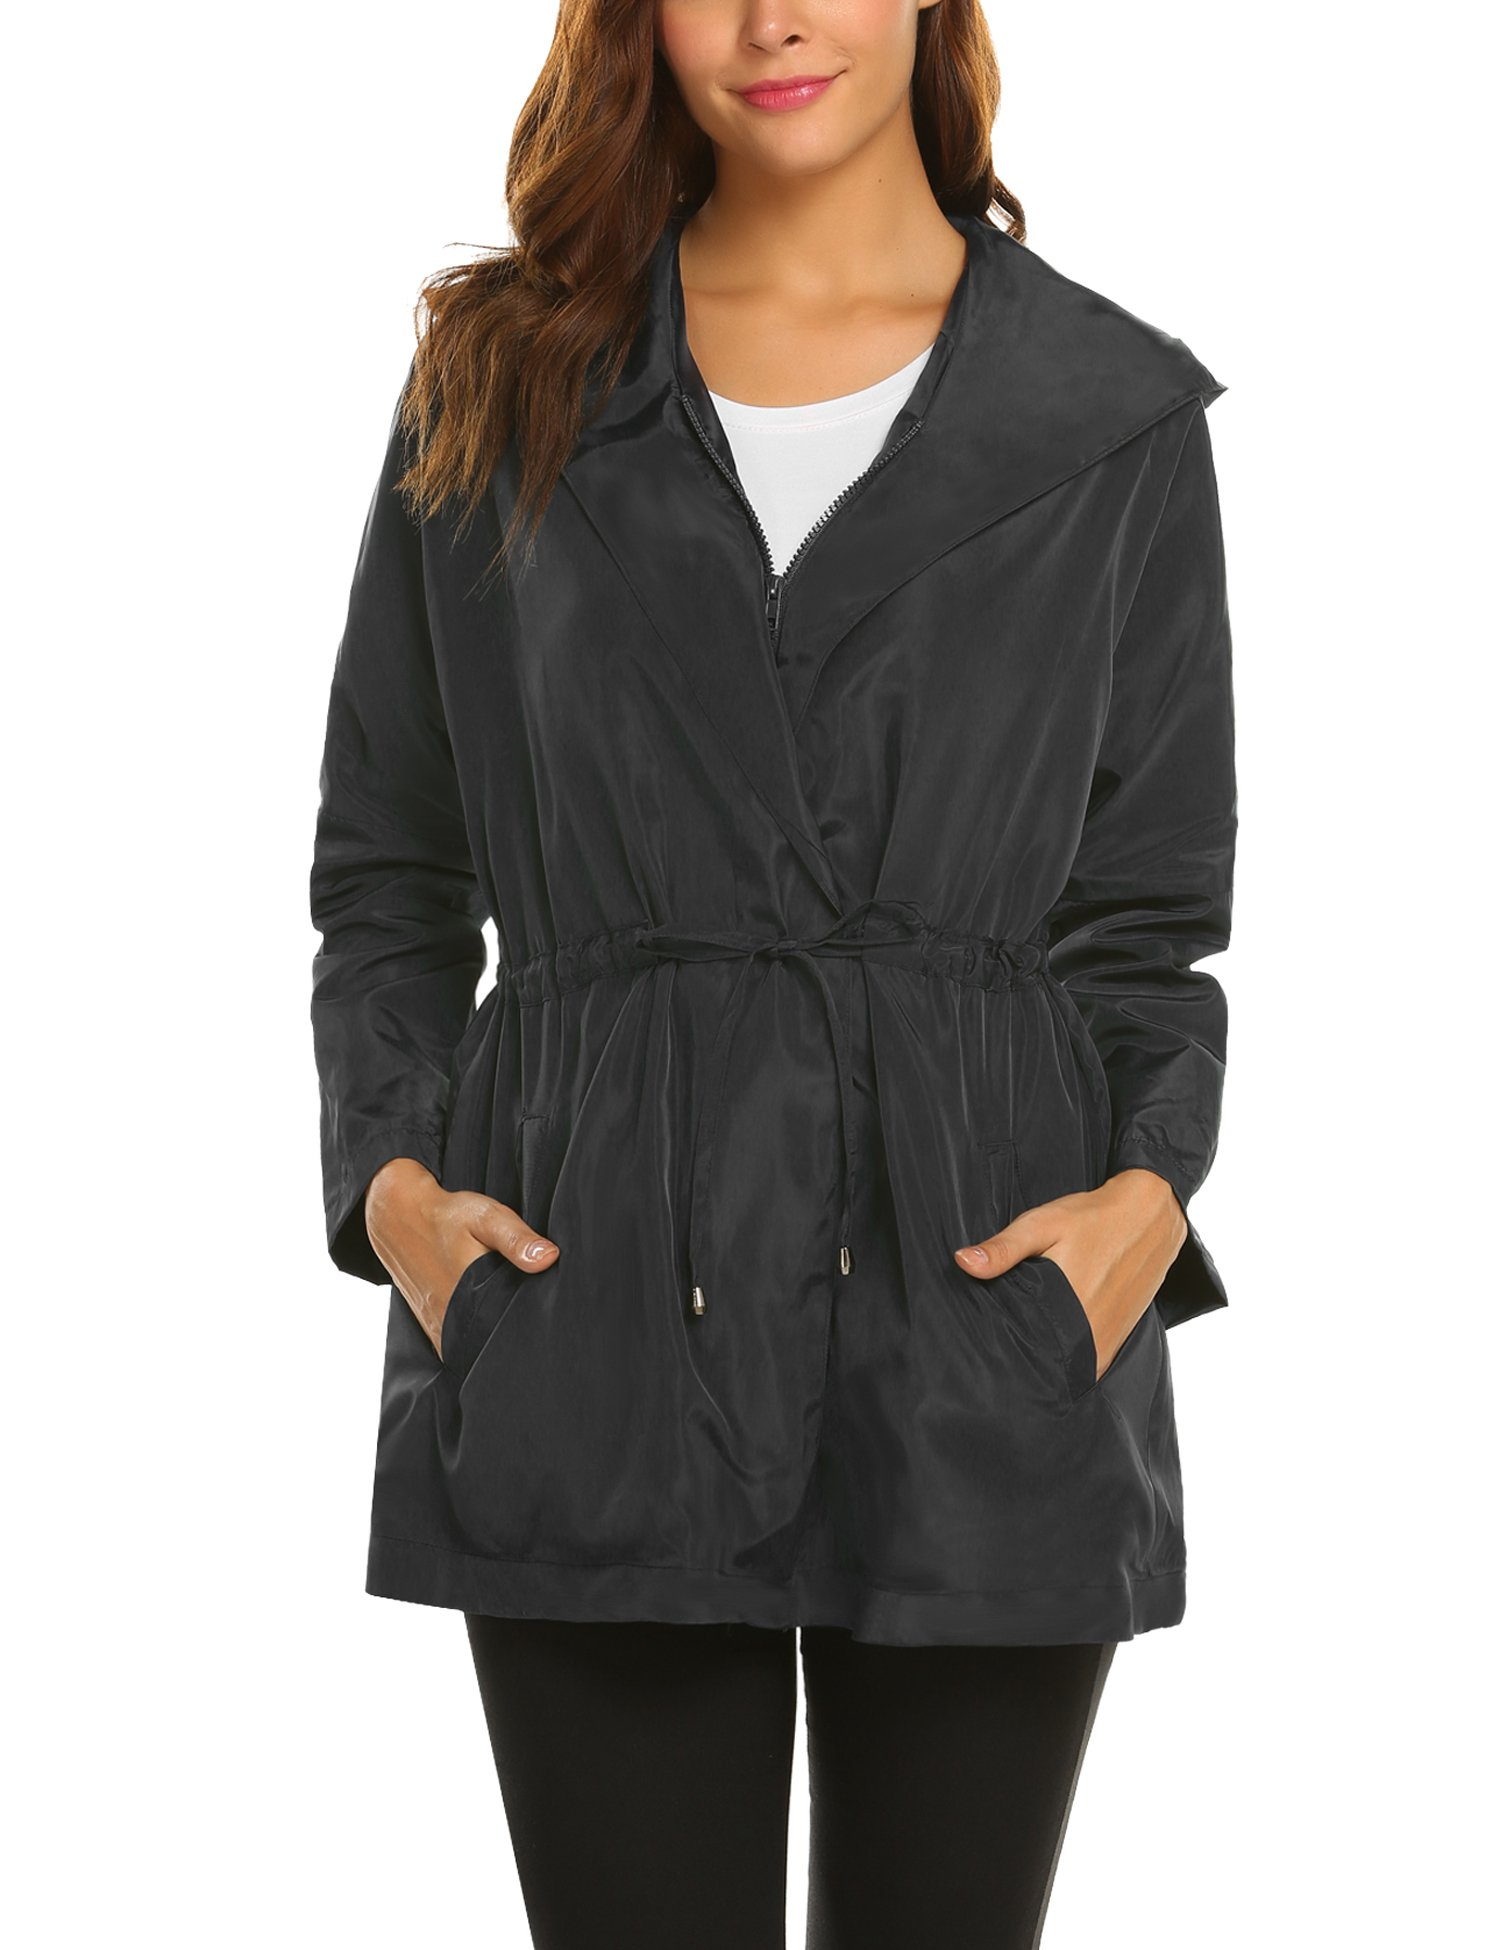 SummerRio Womens Lightweight Travel Trench Waterproof Raincoat Hoodie Windproof Hiking Coat Packable Rain Jacket